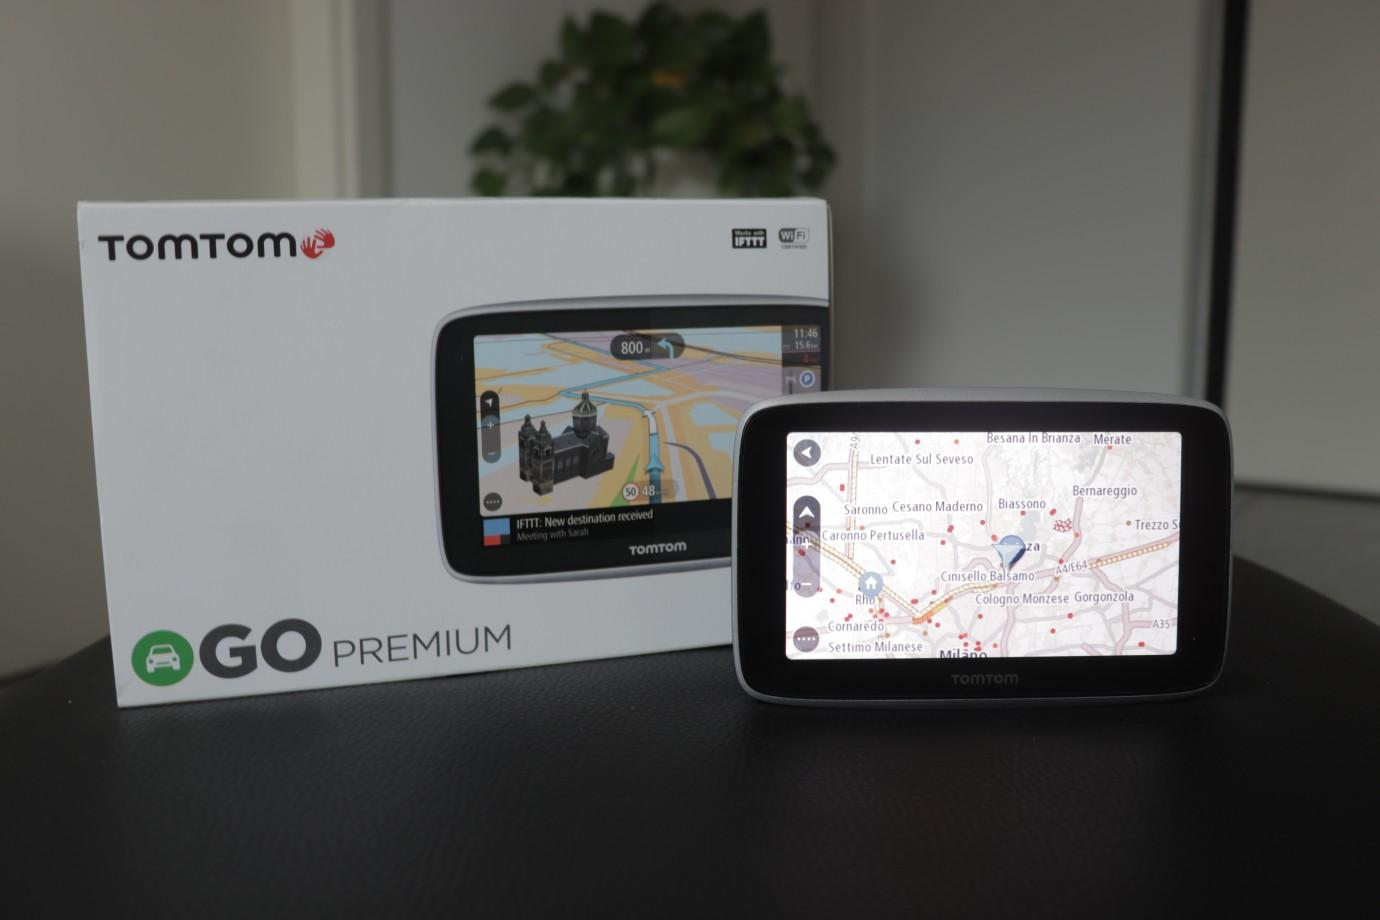 TomTom GO Premium - 5 Cose Da Sapere